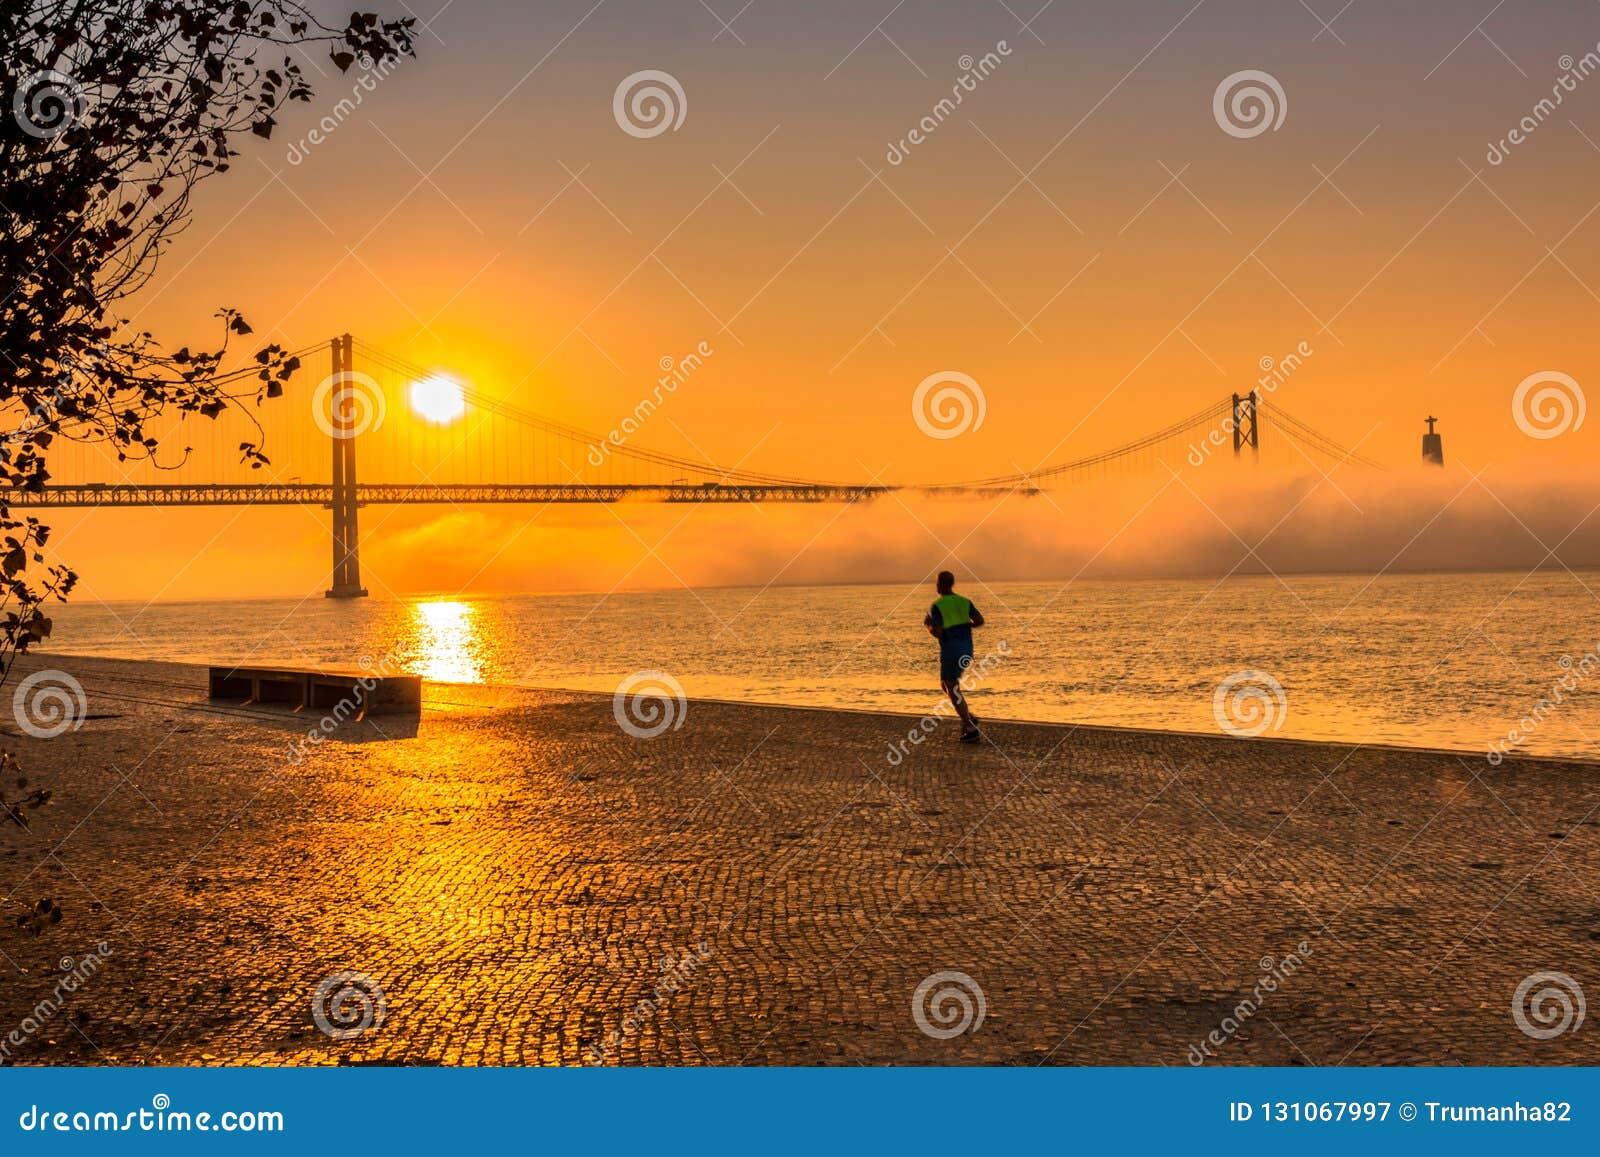 A Man Running at Gorgeous Orange Sunrise